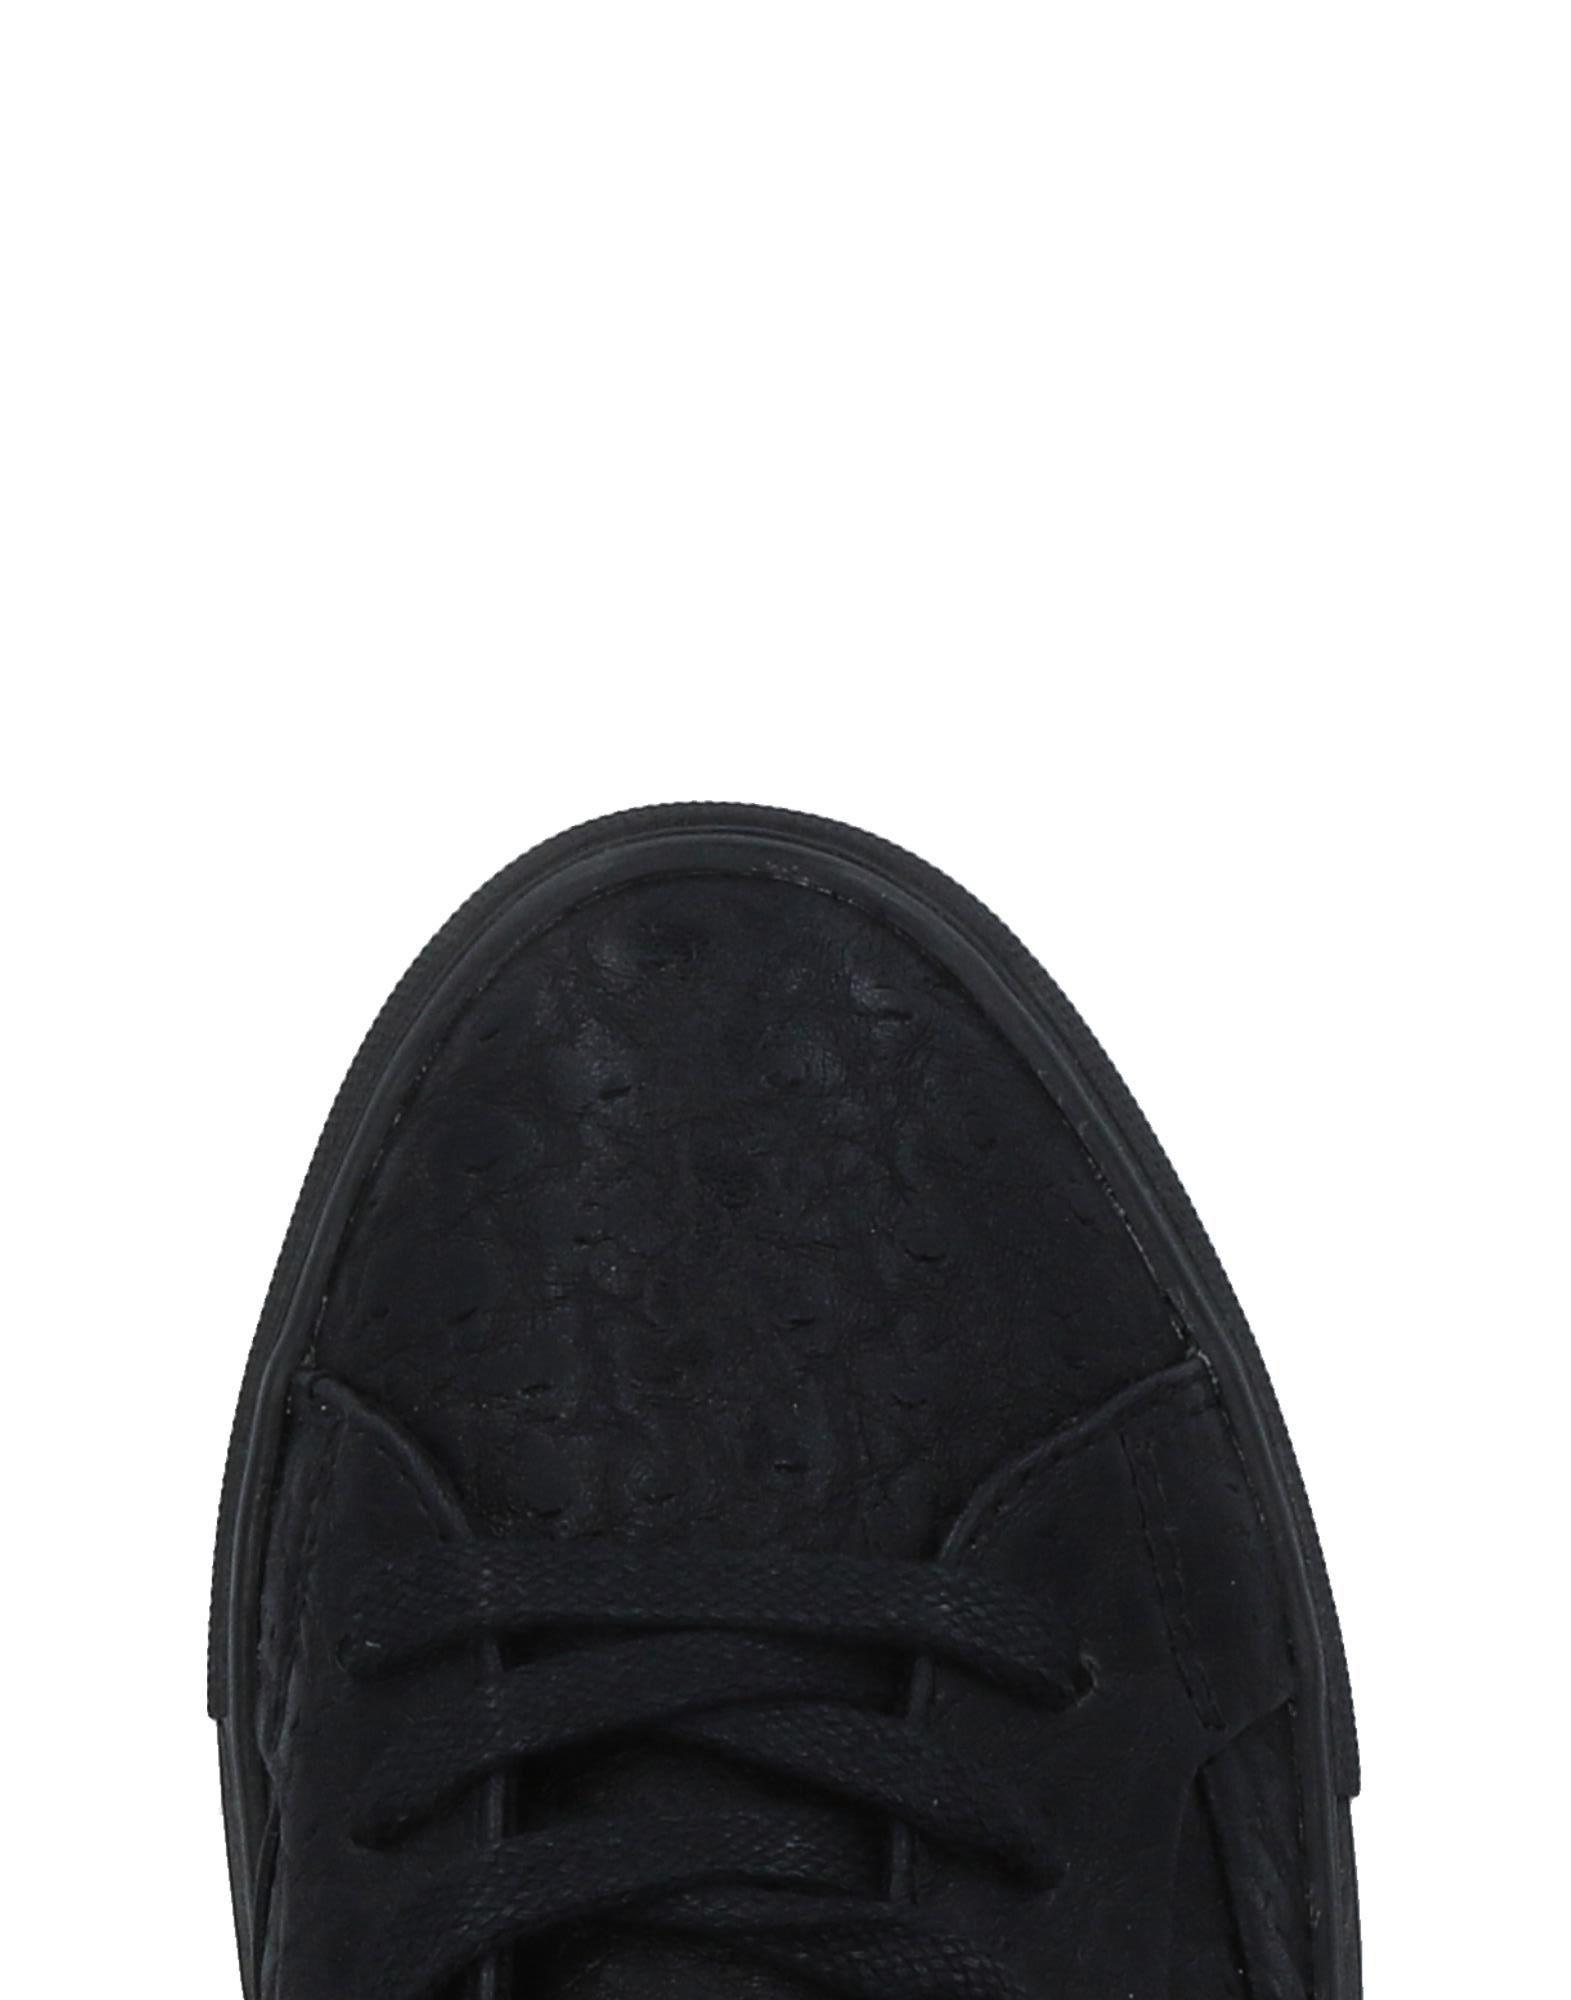 Replay  Sneakers Damen  Replay 11493348IS Heiße Schuhe 2b66b1